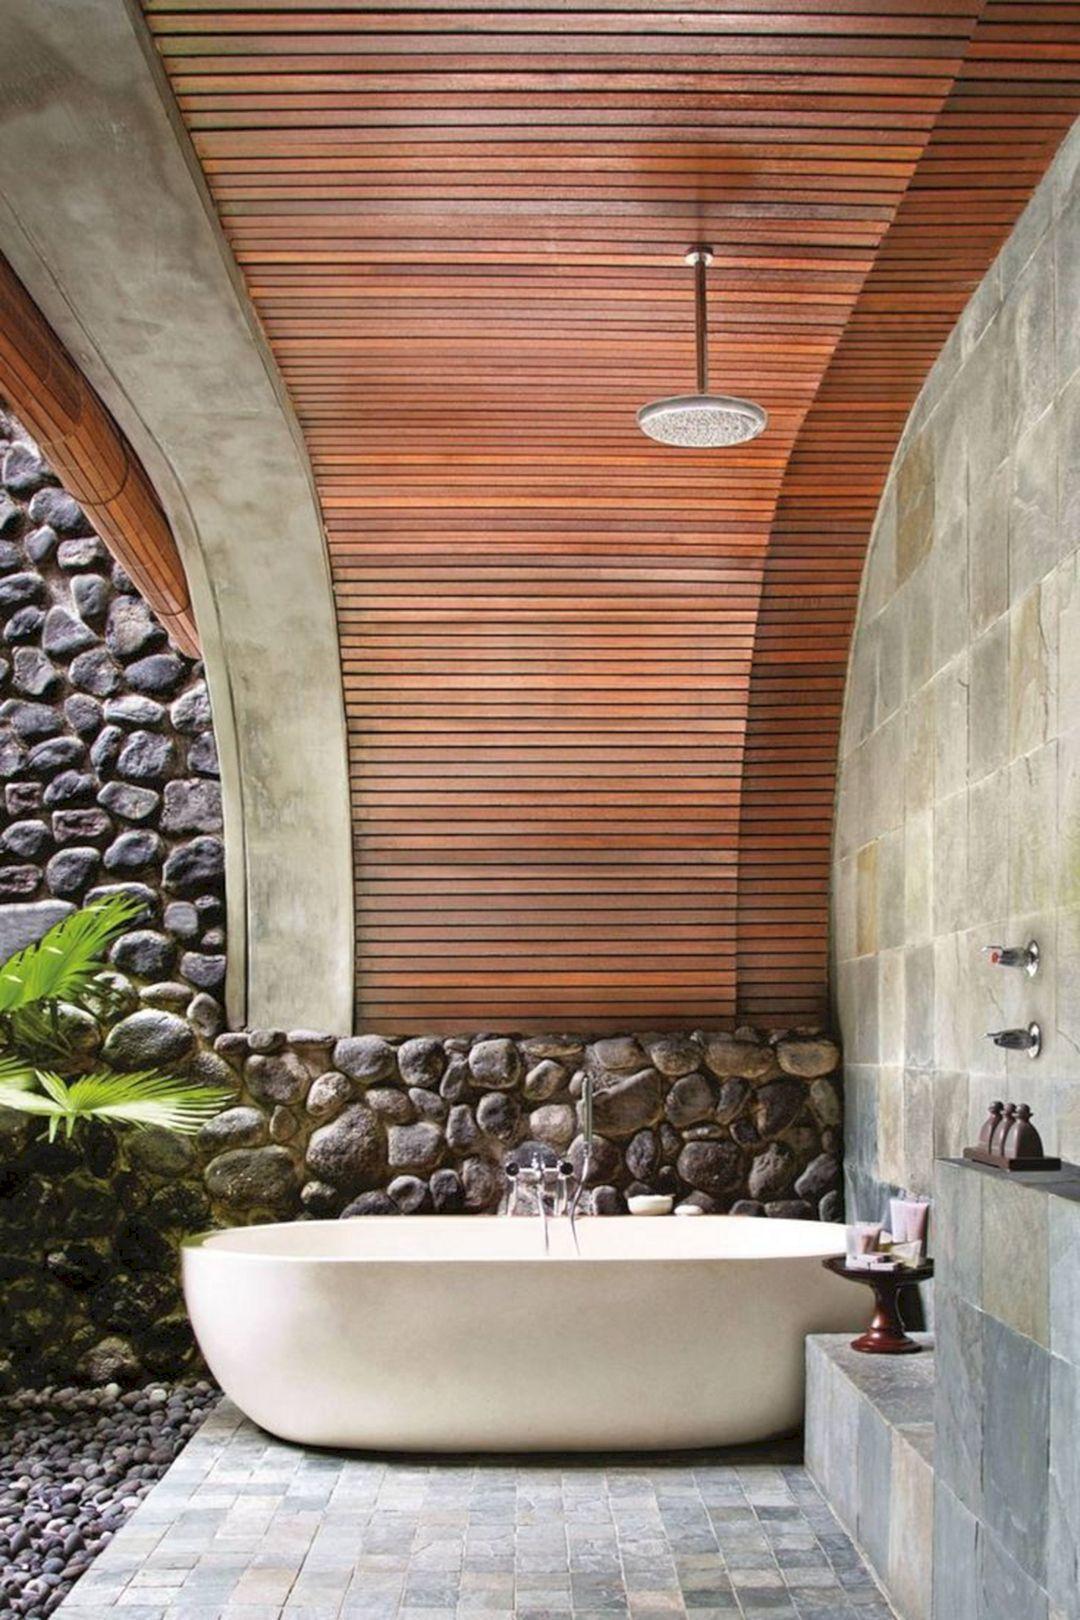 15 Best Outdoor Bathroom Design Ideas For Inspiration In 2020 Outdoor Bathroom Design Outdoor Bathrooms Outdoor Baths